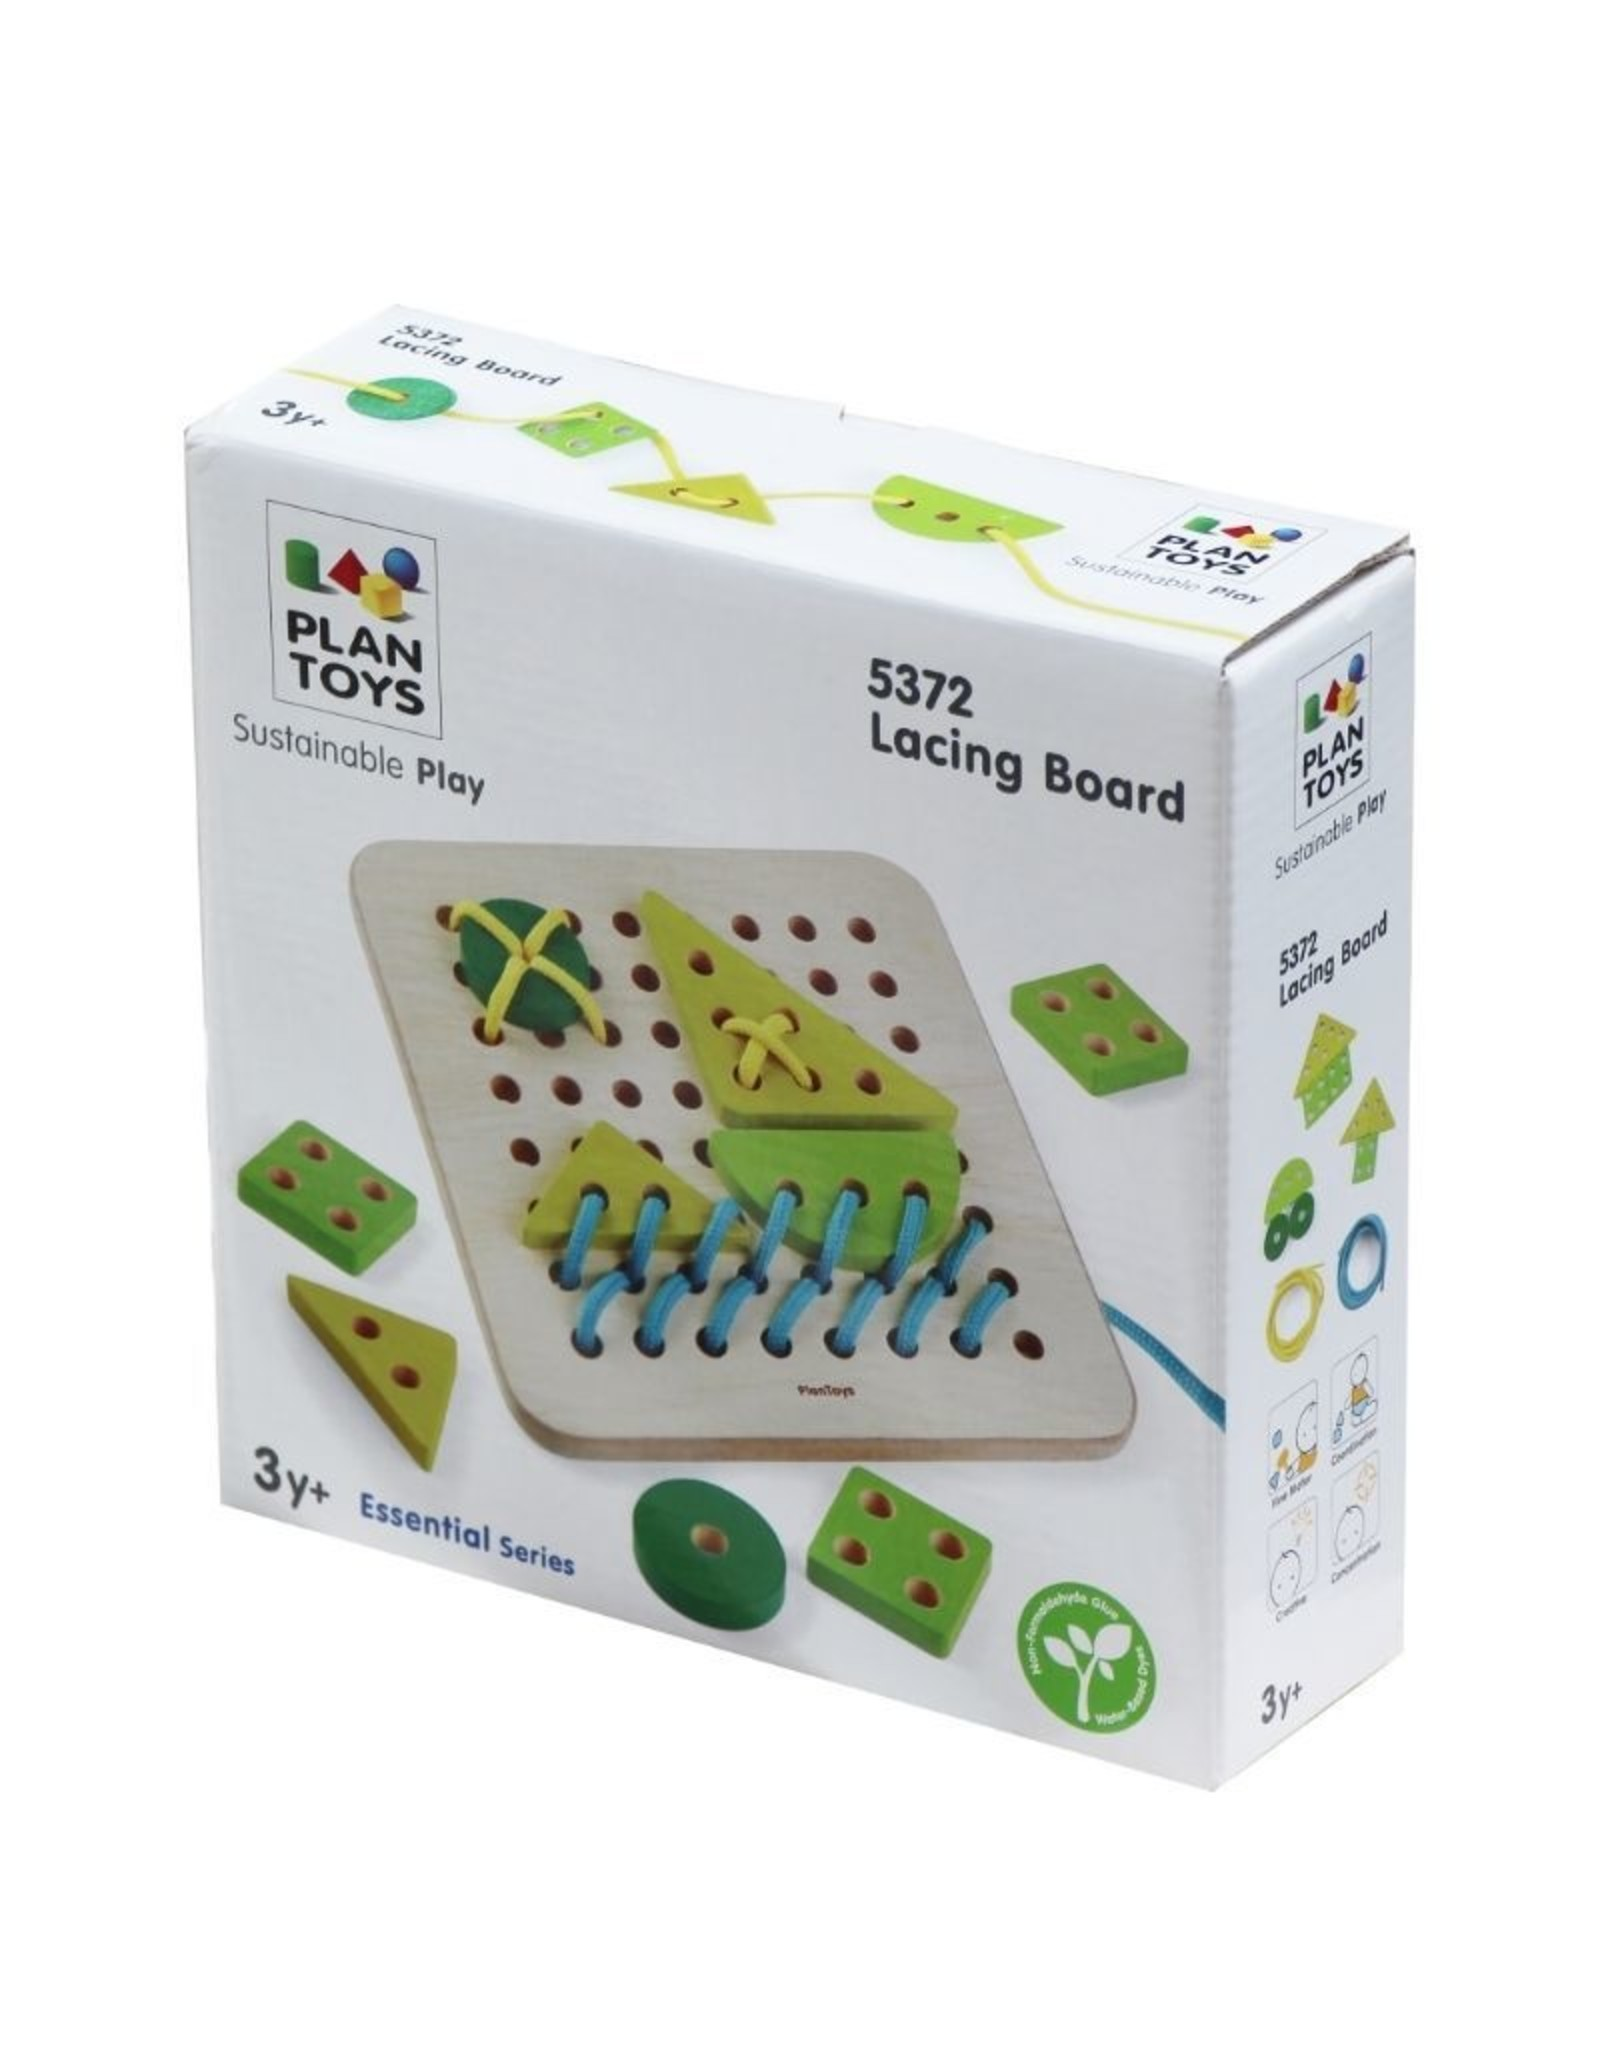 Plan Toys Lacing Board